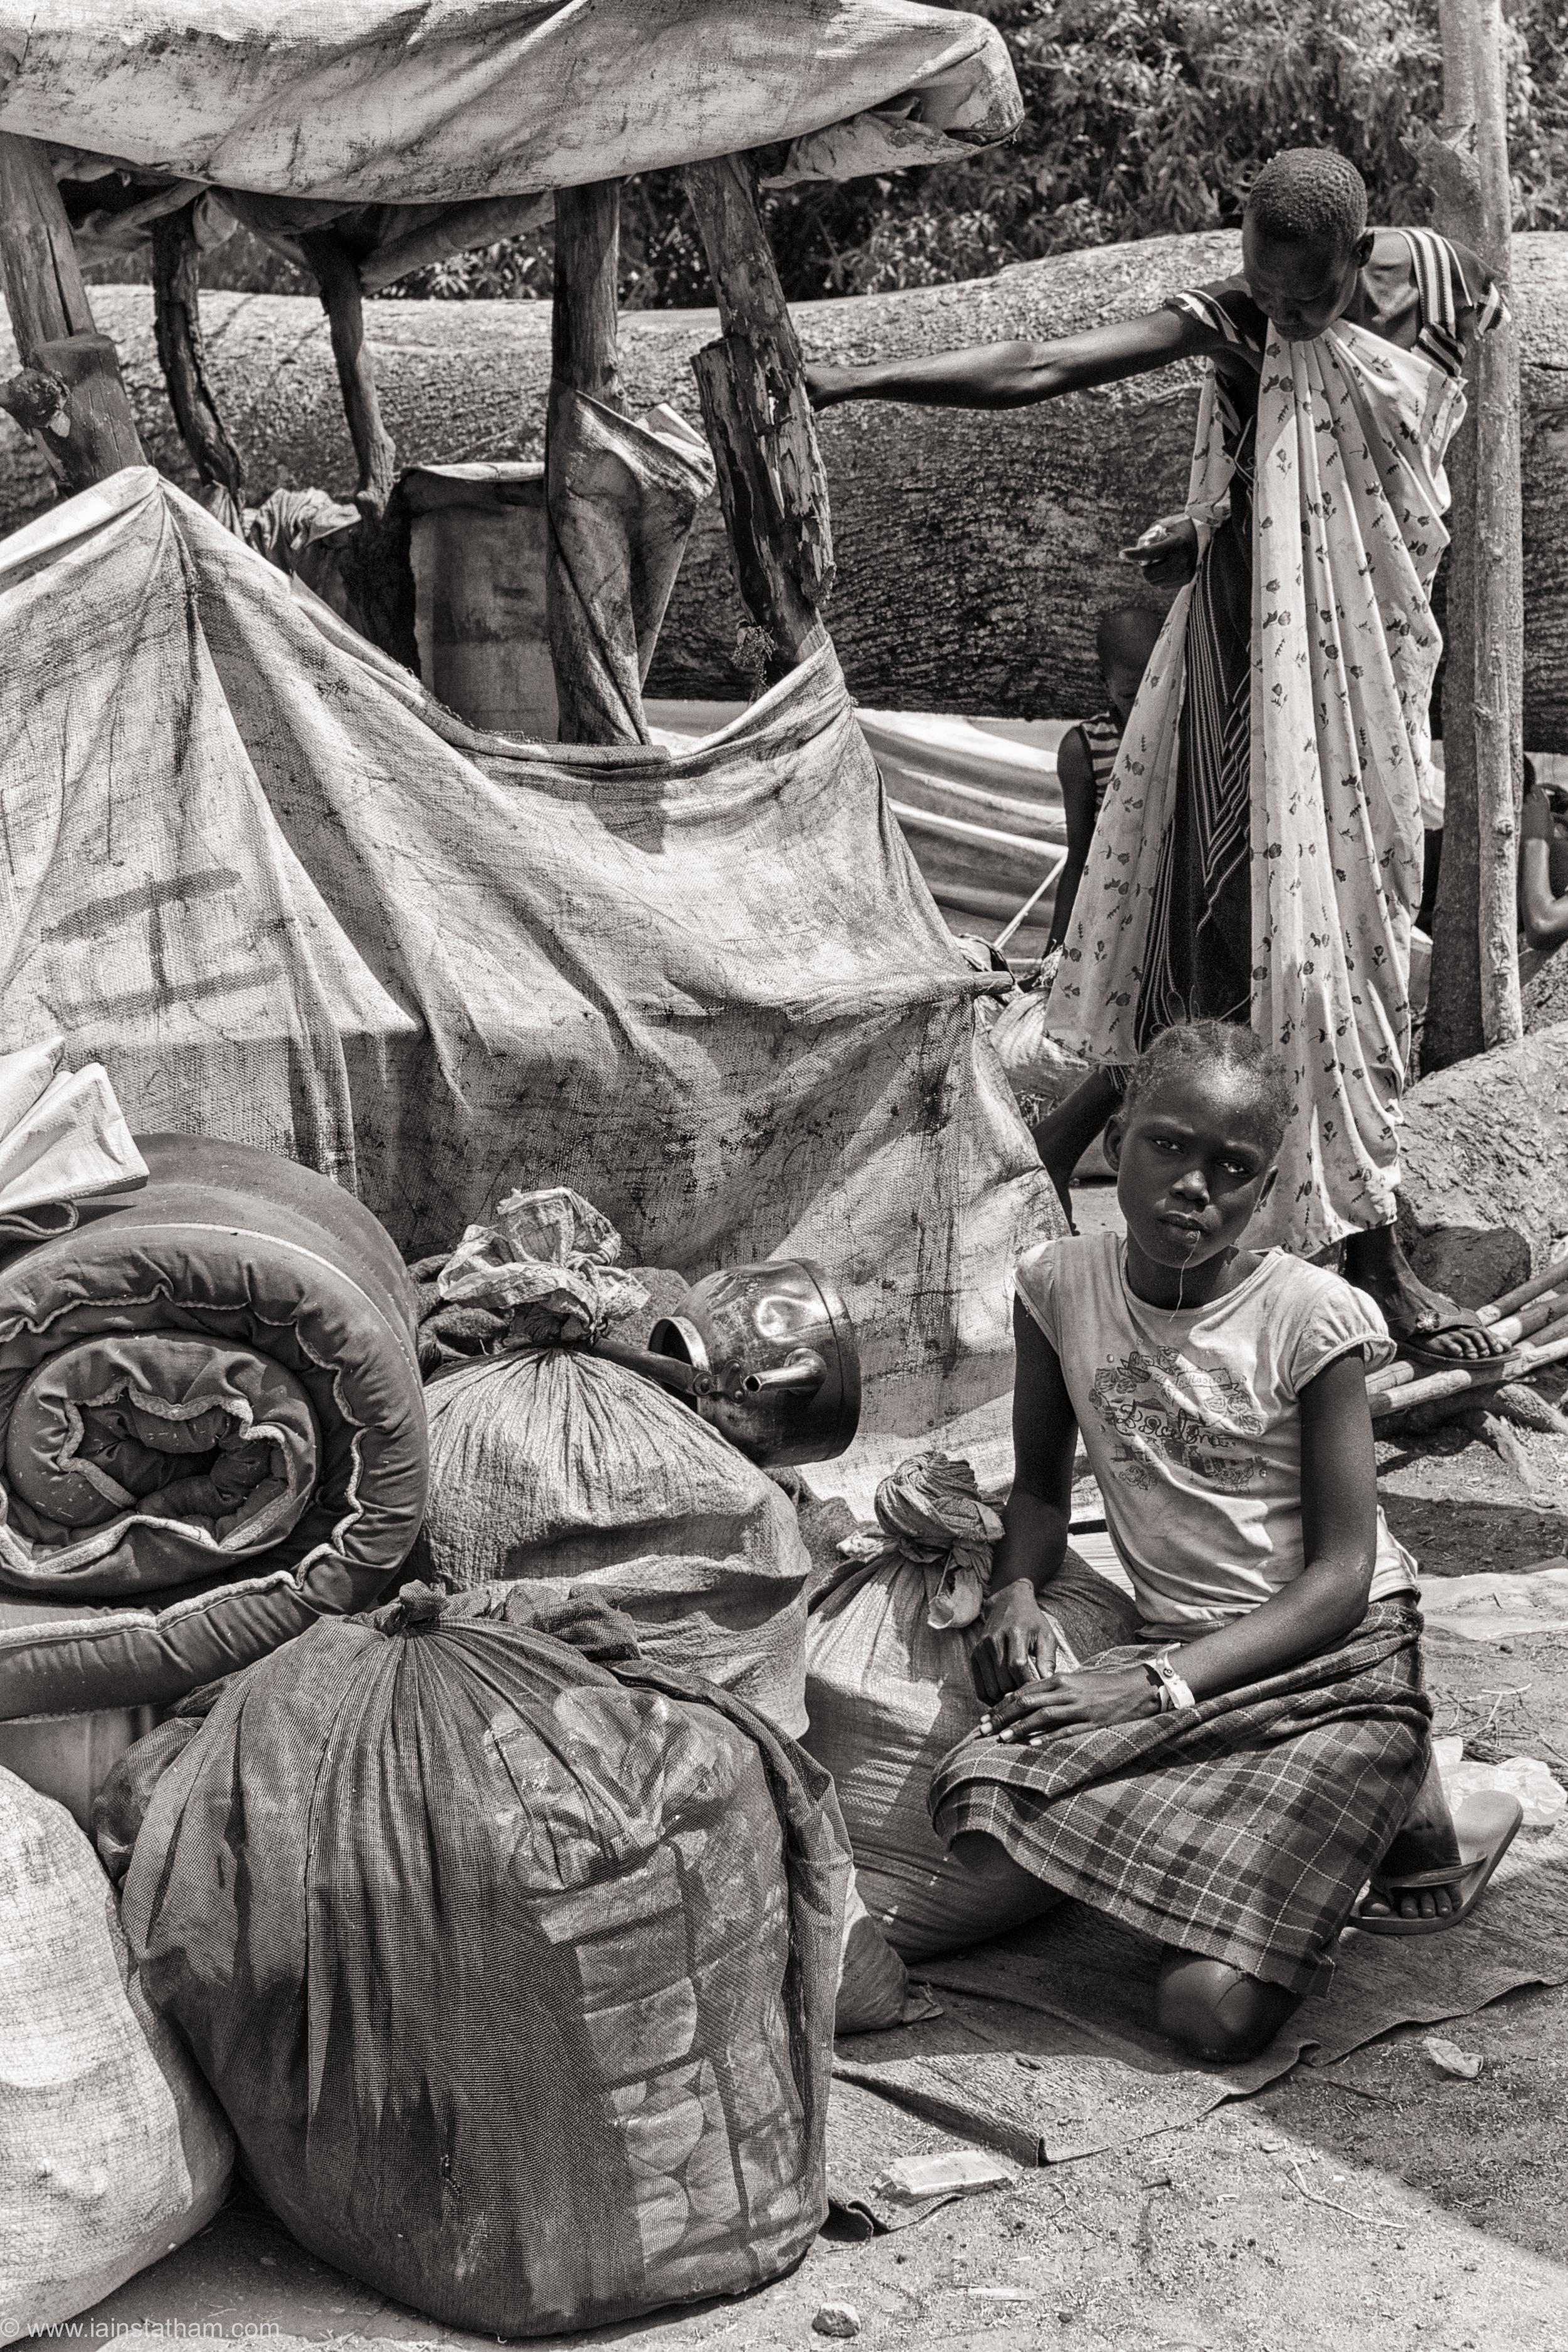 ug - south sudan refugees - dziapi - bw-7.jpg